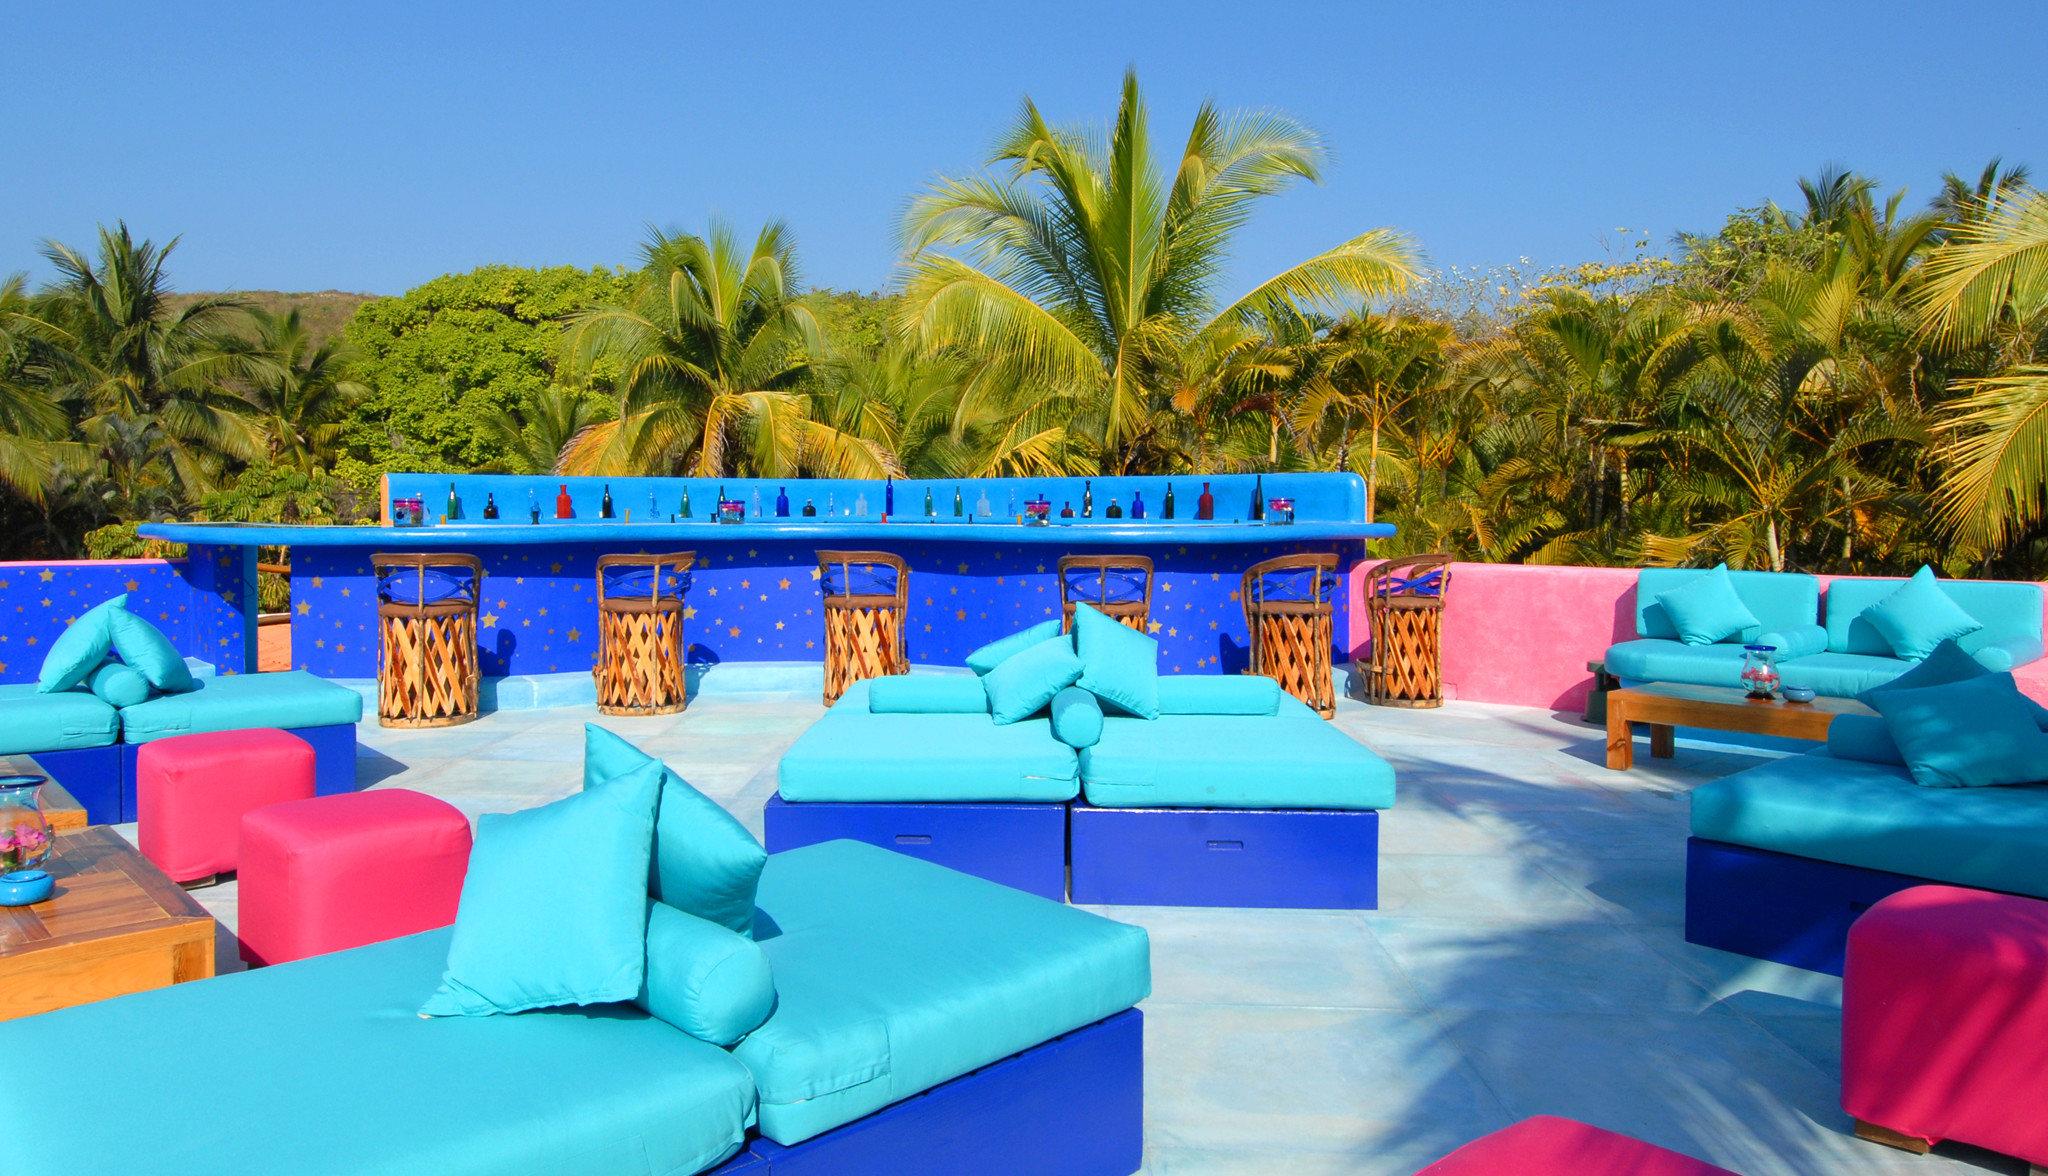 Deck Hip Lounge tree sky leisure swimming pool Resort Water park amusement park Villa blue colorful sofa colored